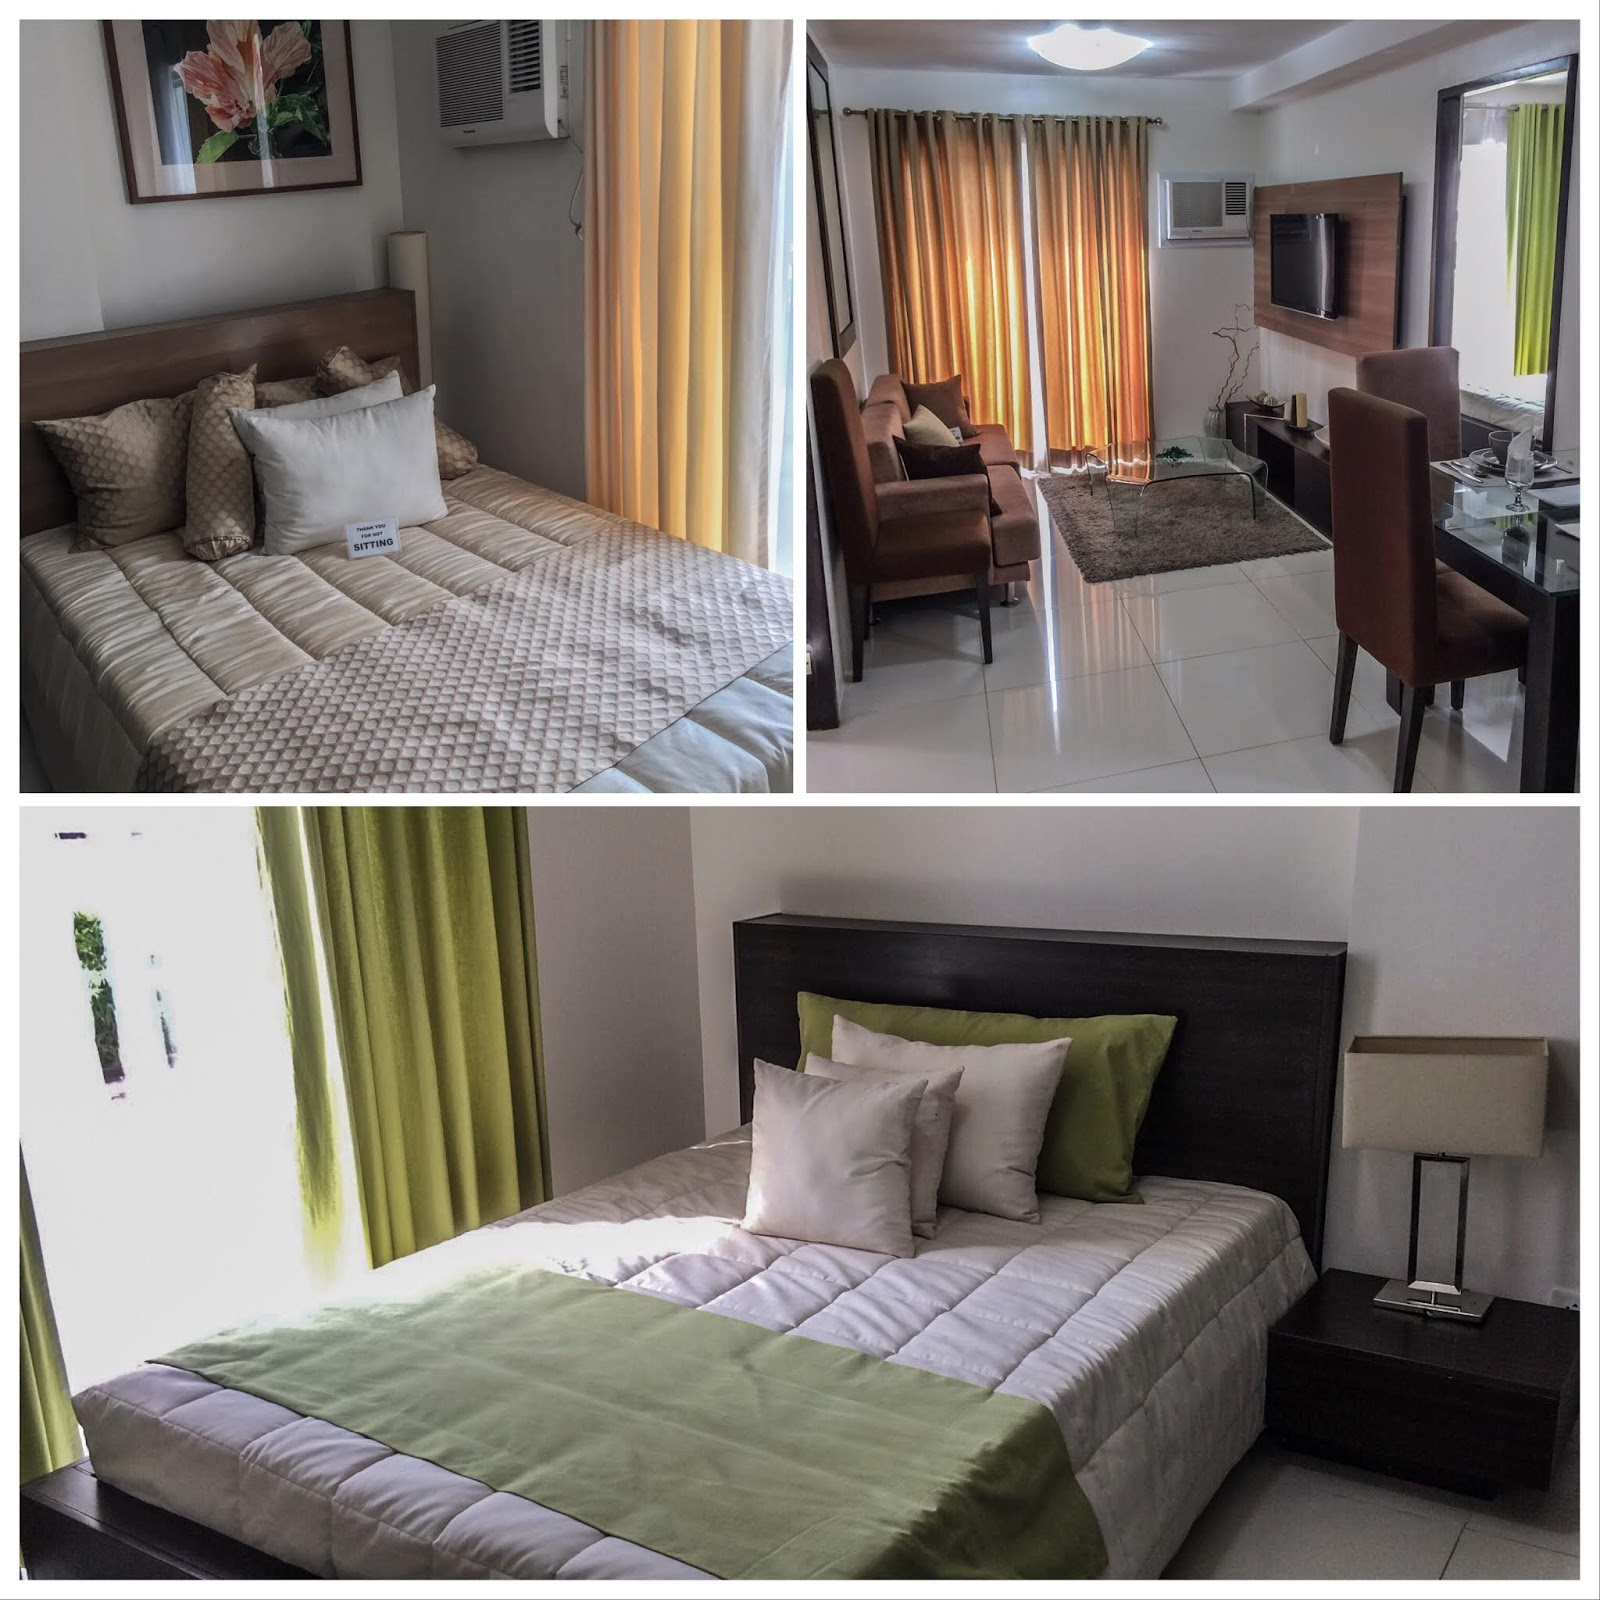 Bamboo Bay Community Mandaue Condo Showroom 3 with 2 bedrooms